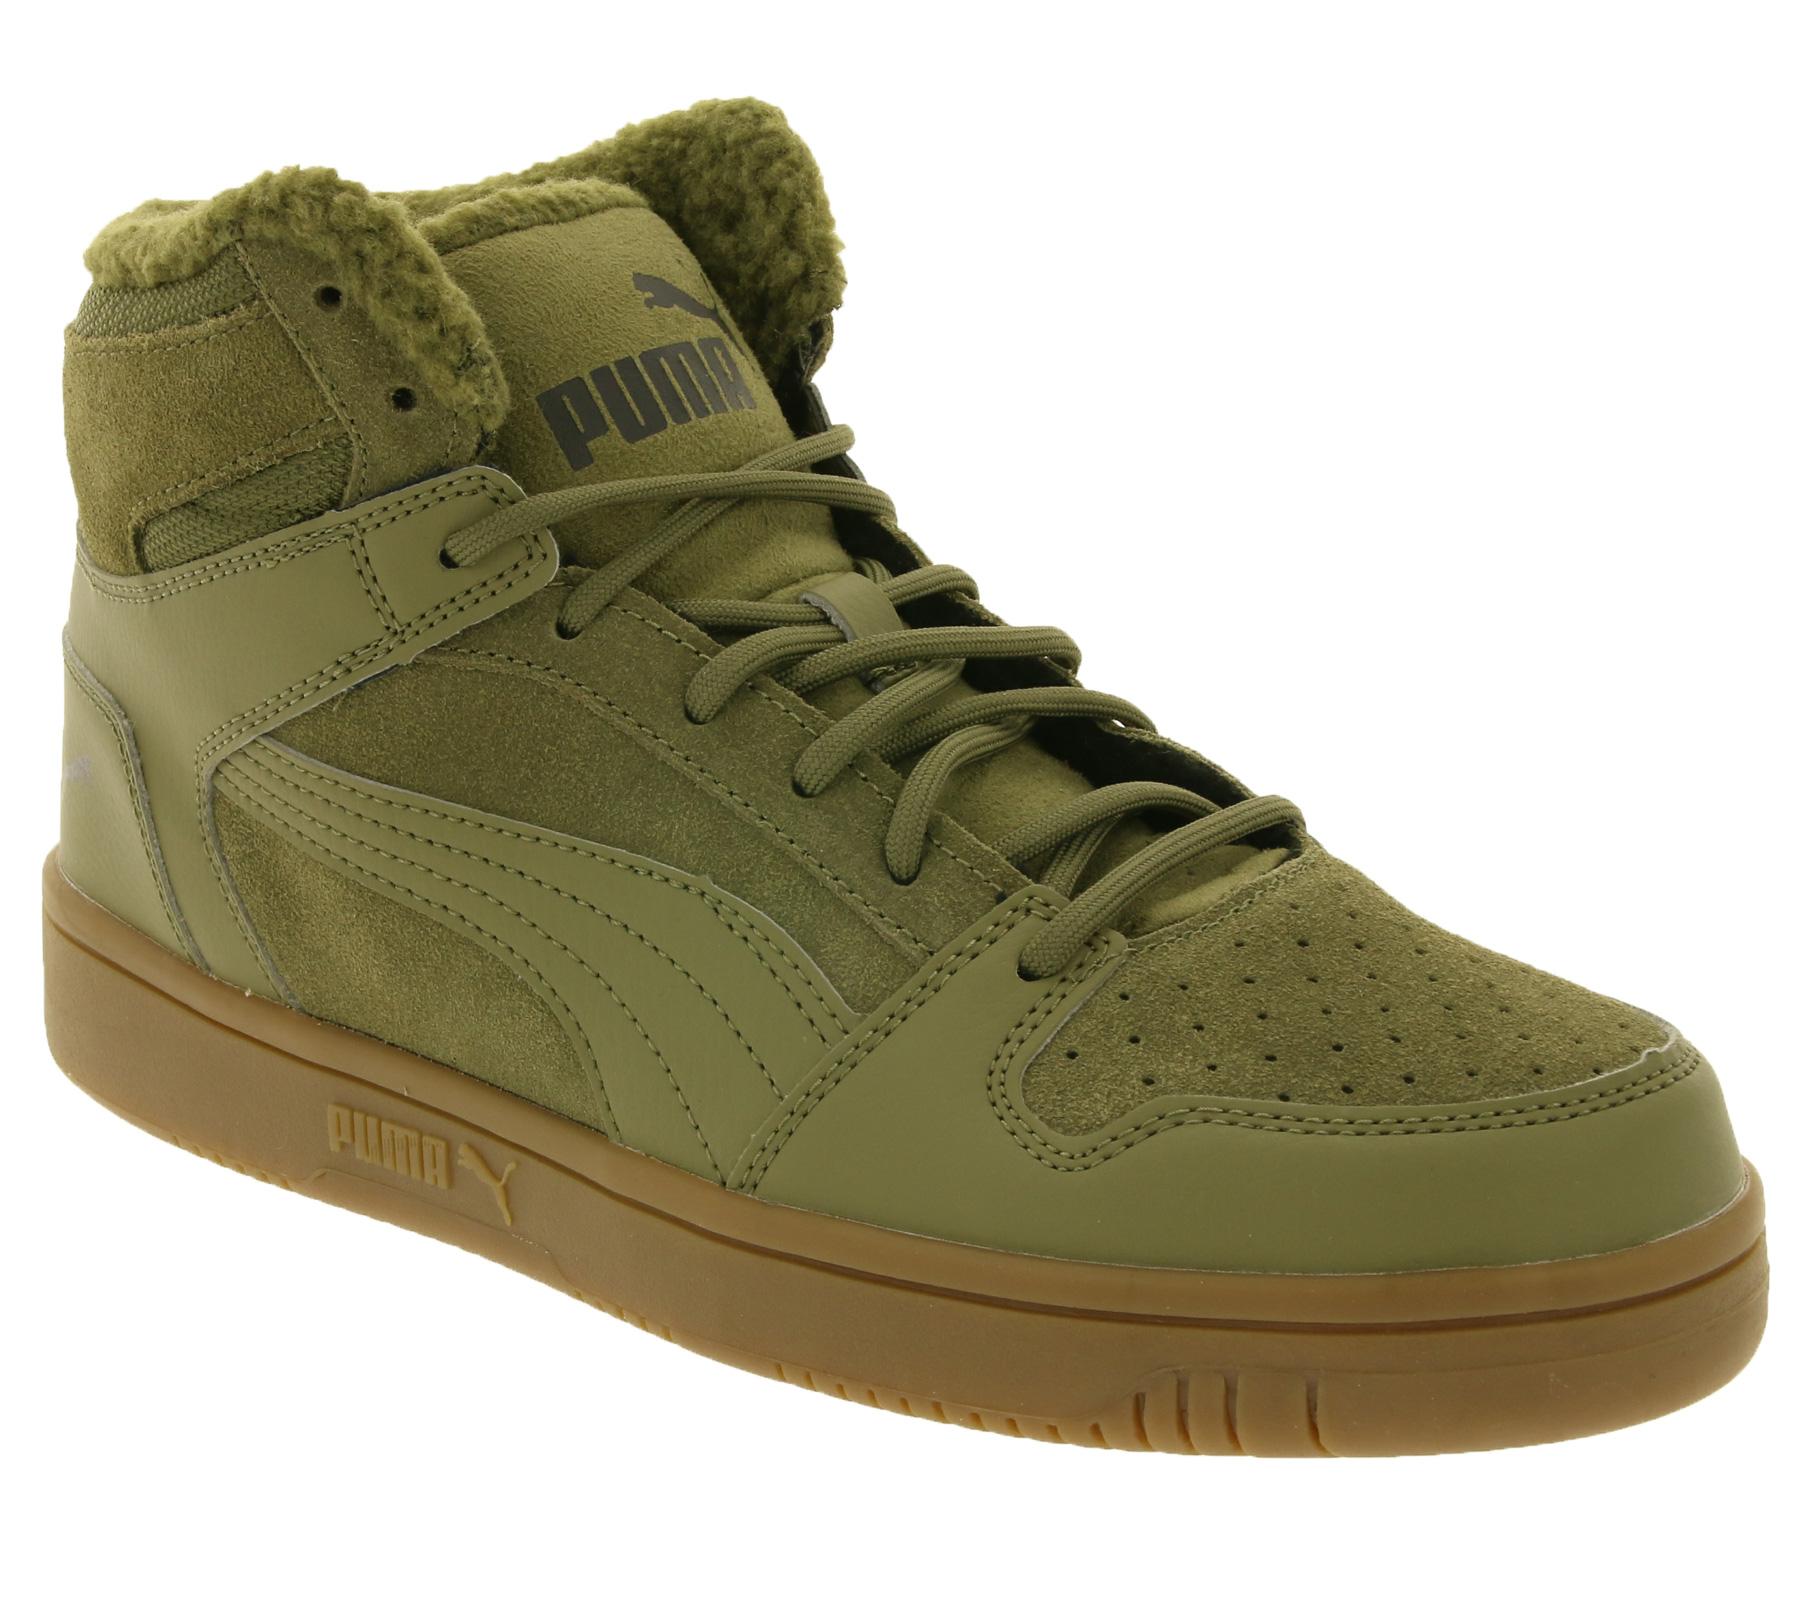 PUMA Schuhe Herren High Top Sneaker Boots Rebound LayUp SD